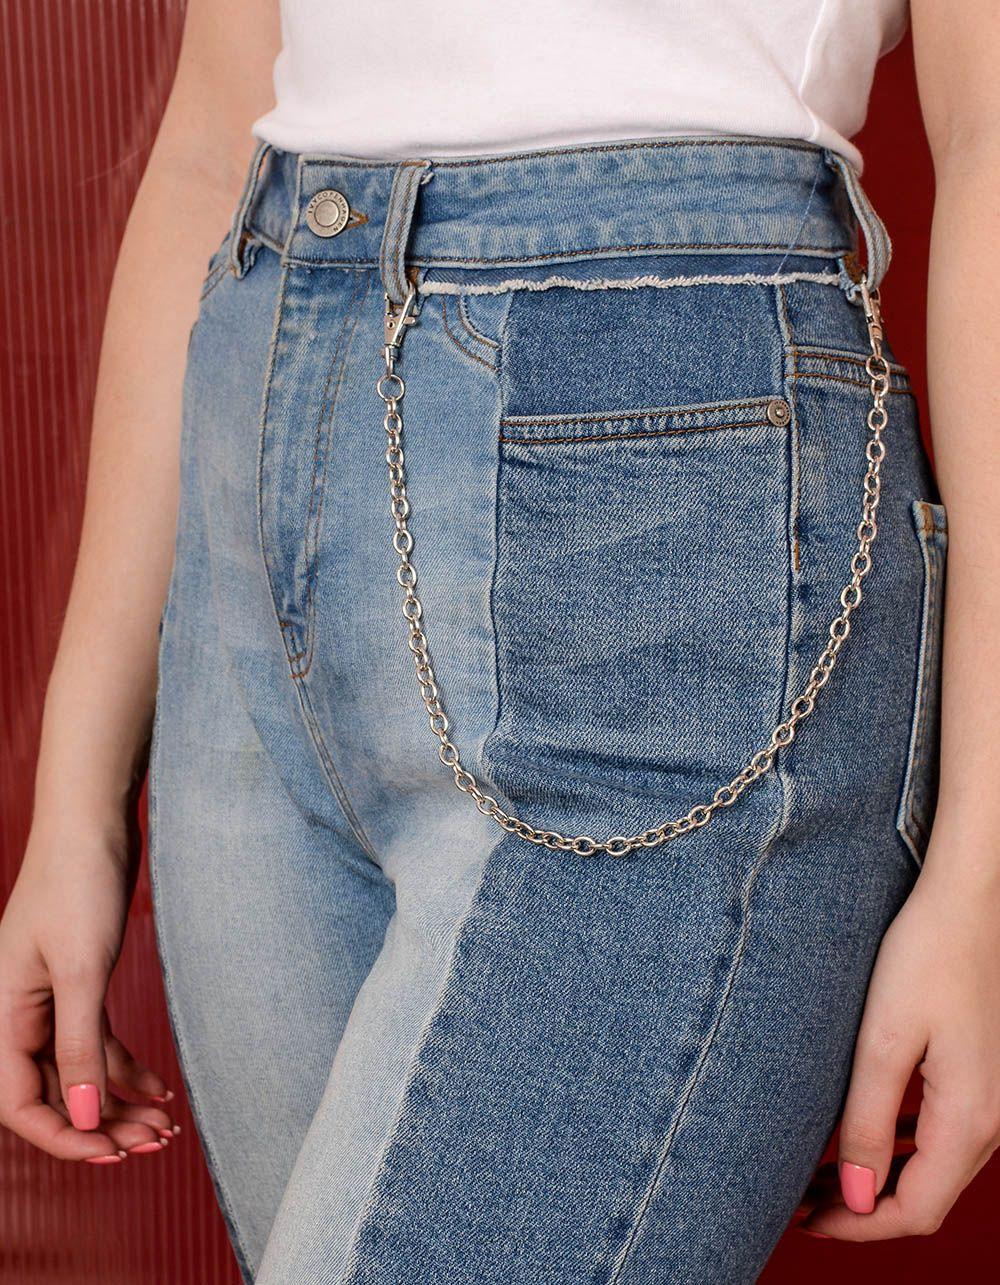 Ланцюжок на джинси та одяг | 238836-05-XX